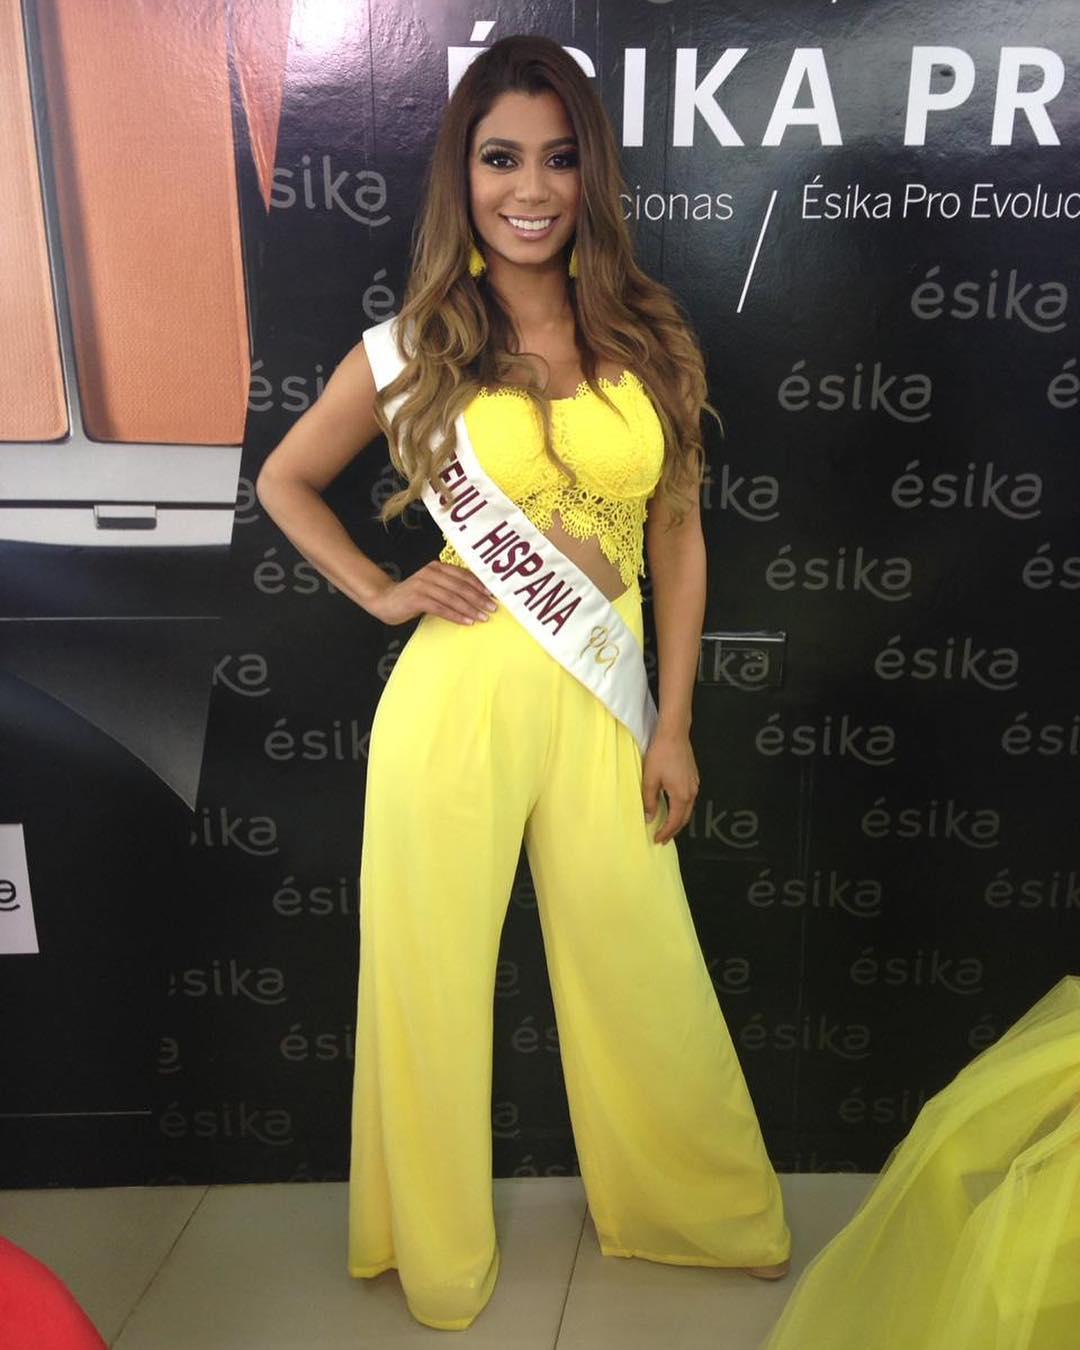 geraldine chaparro, miss usa hispanoamericana 2018/miss mundo latina turismo usa 2018. - Página 2 43984810